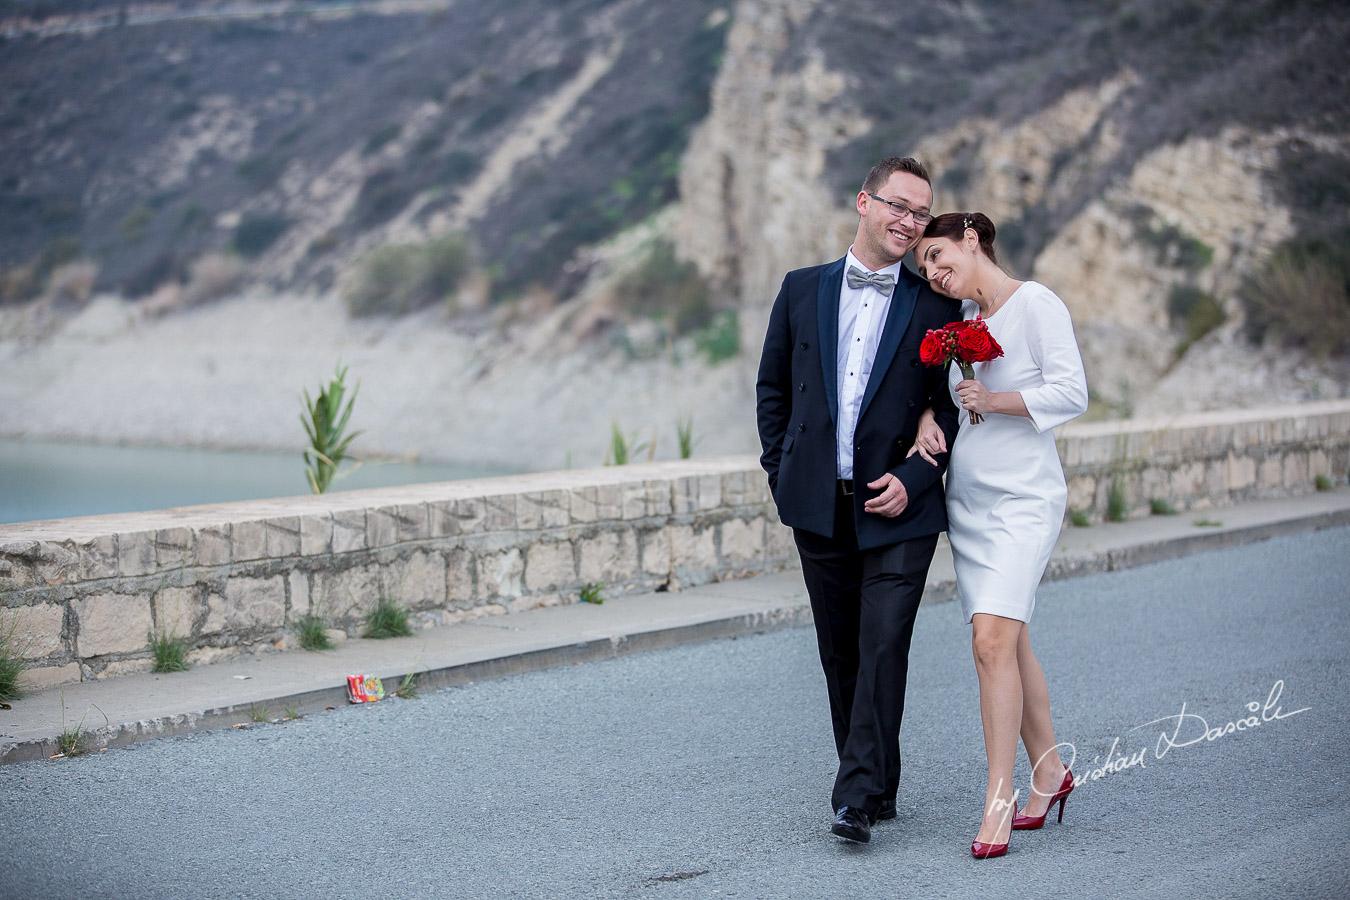 Simple Marriage Ceremony - Irina & Dragos 19